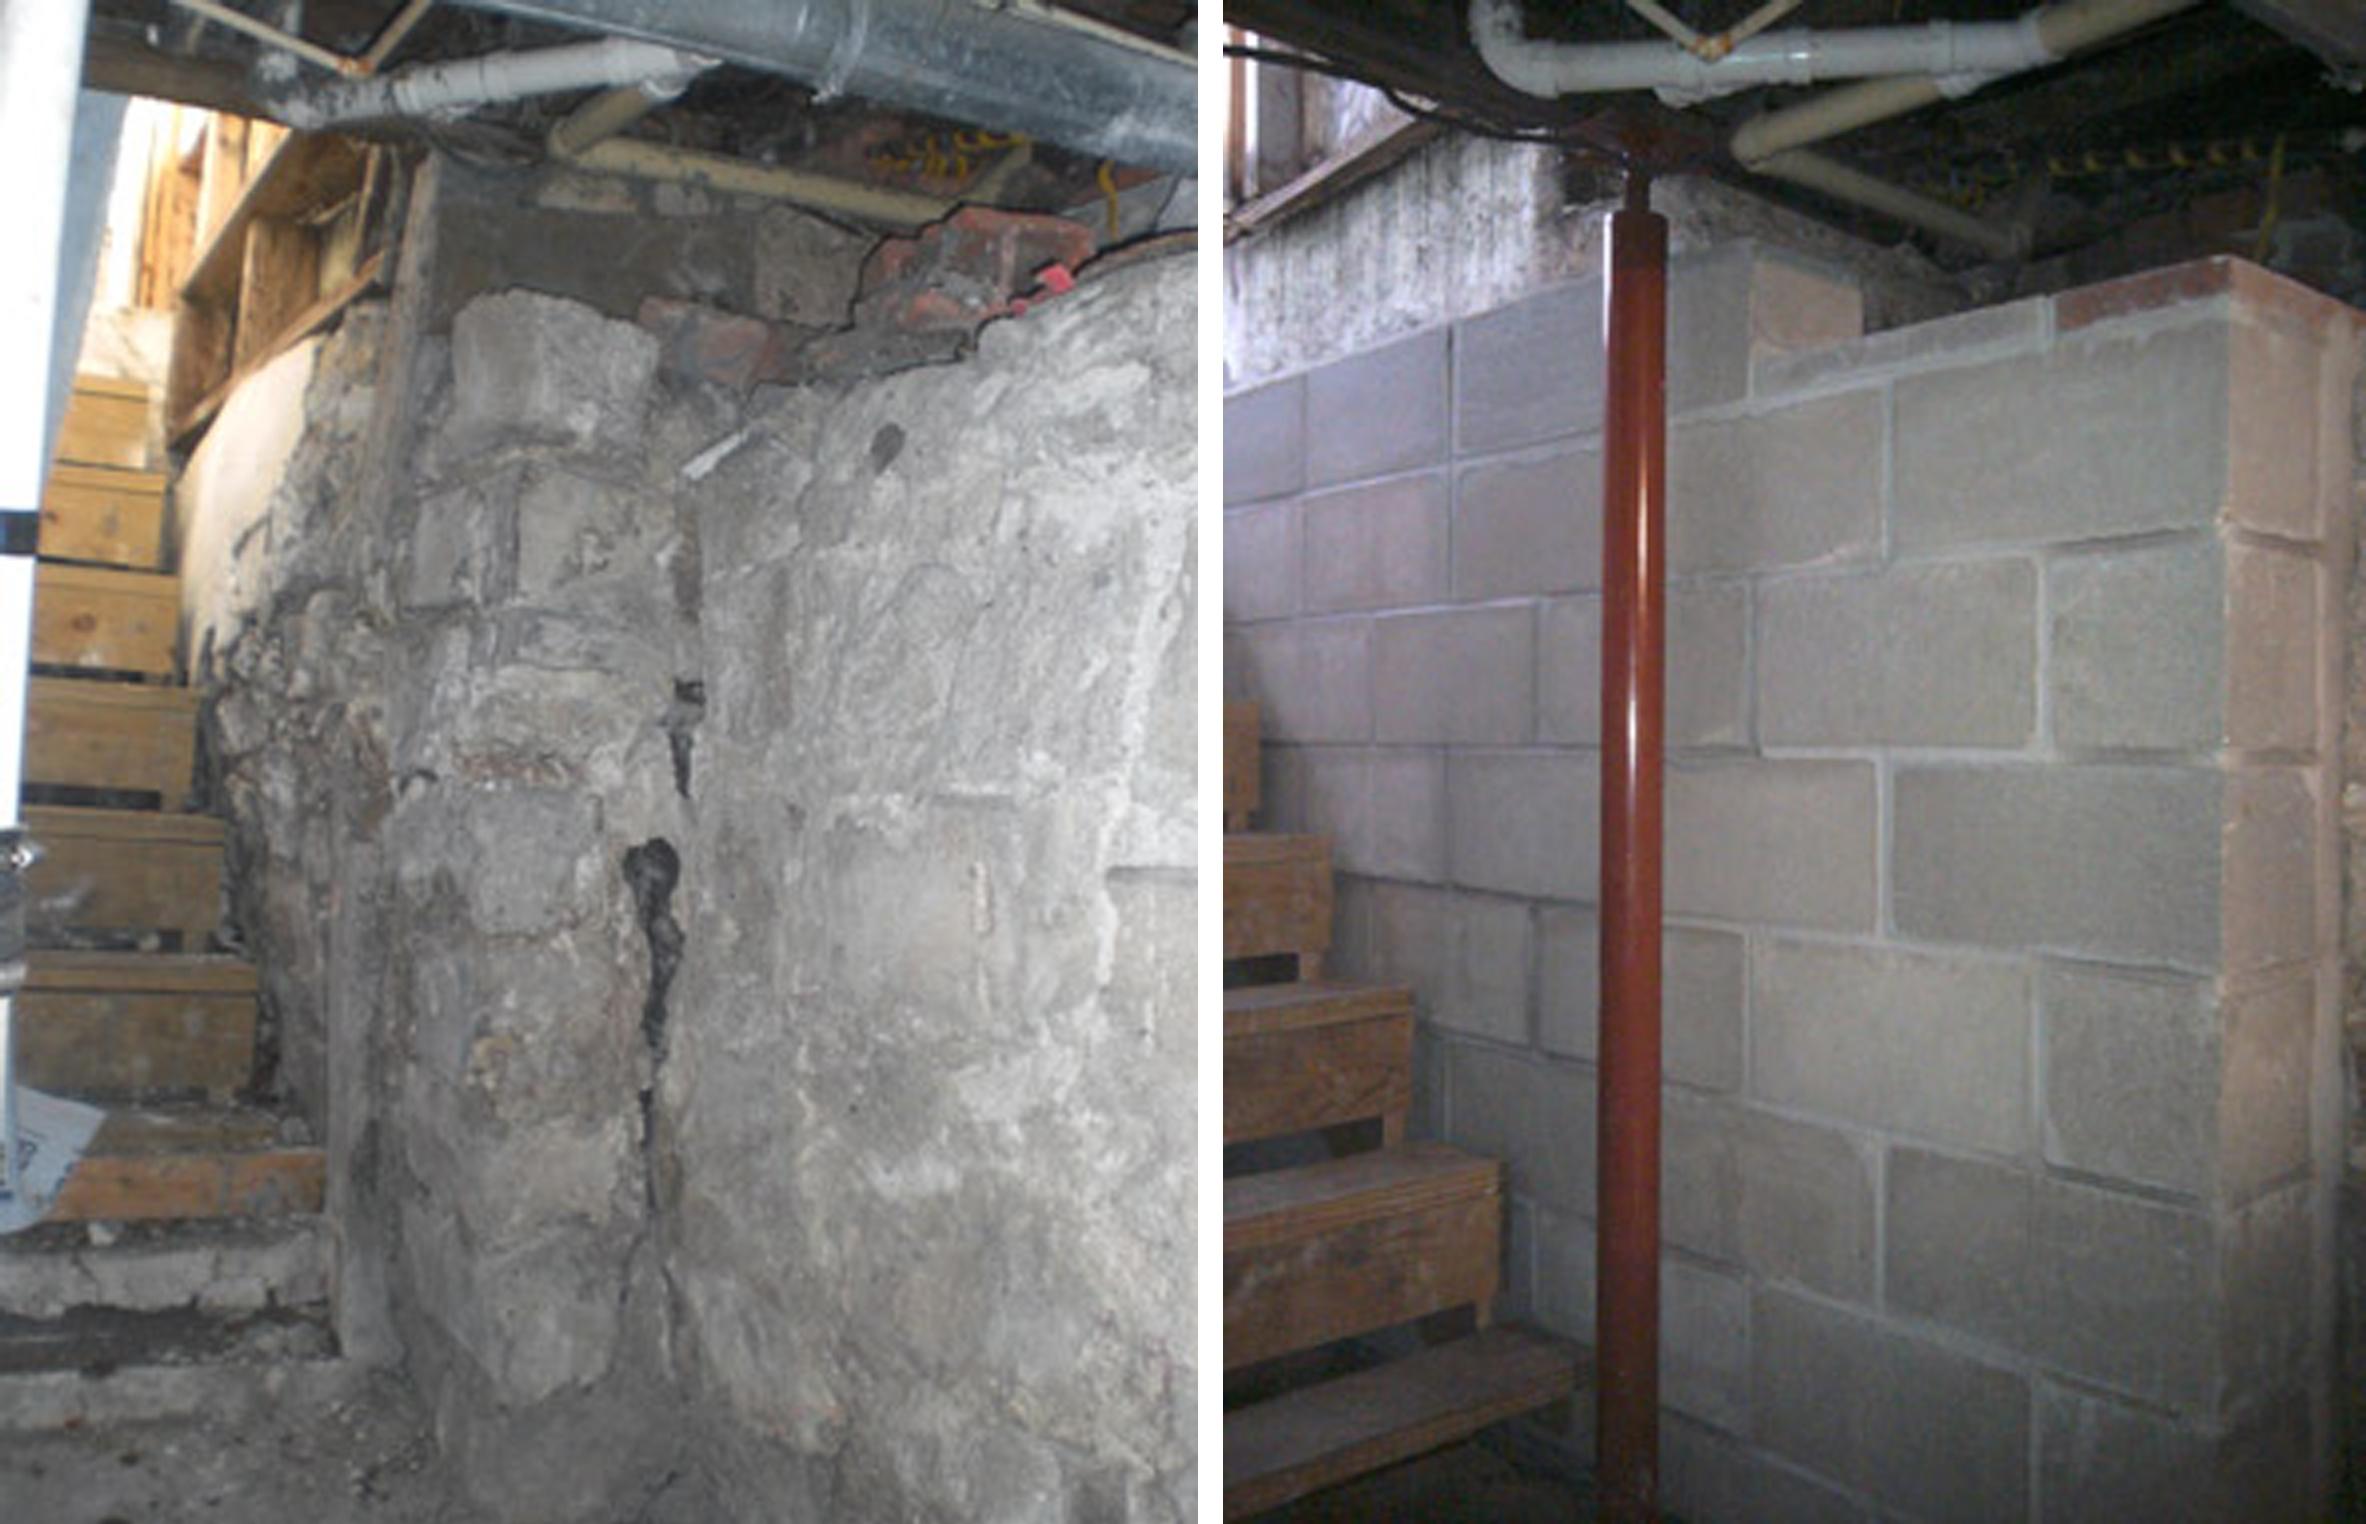 Basement Brick Wall Crumbling